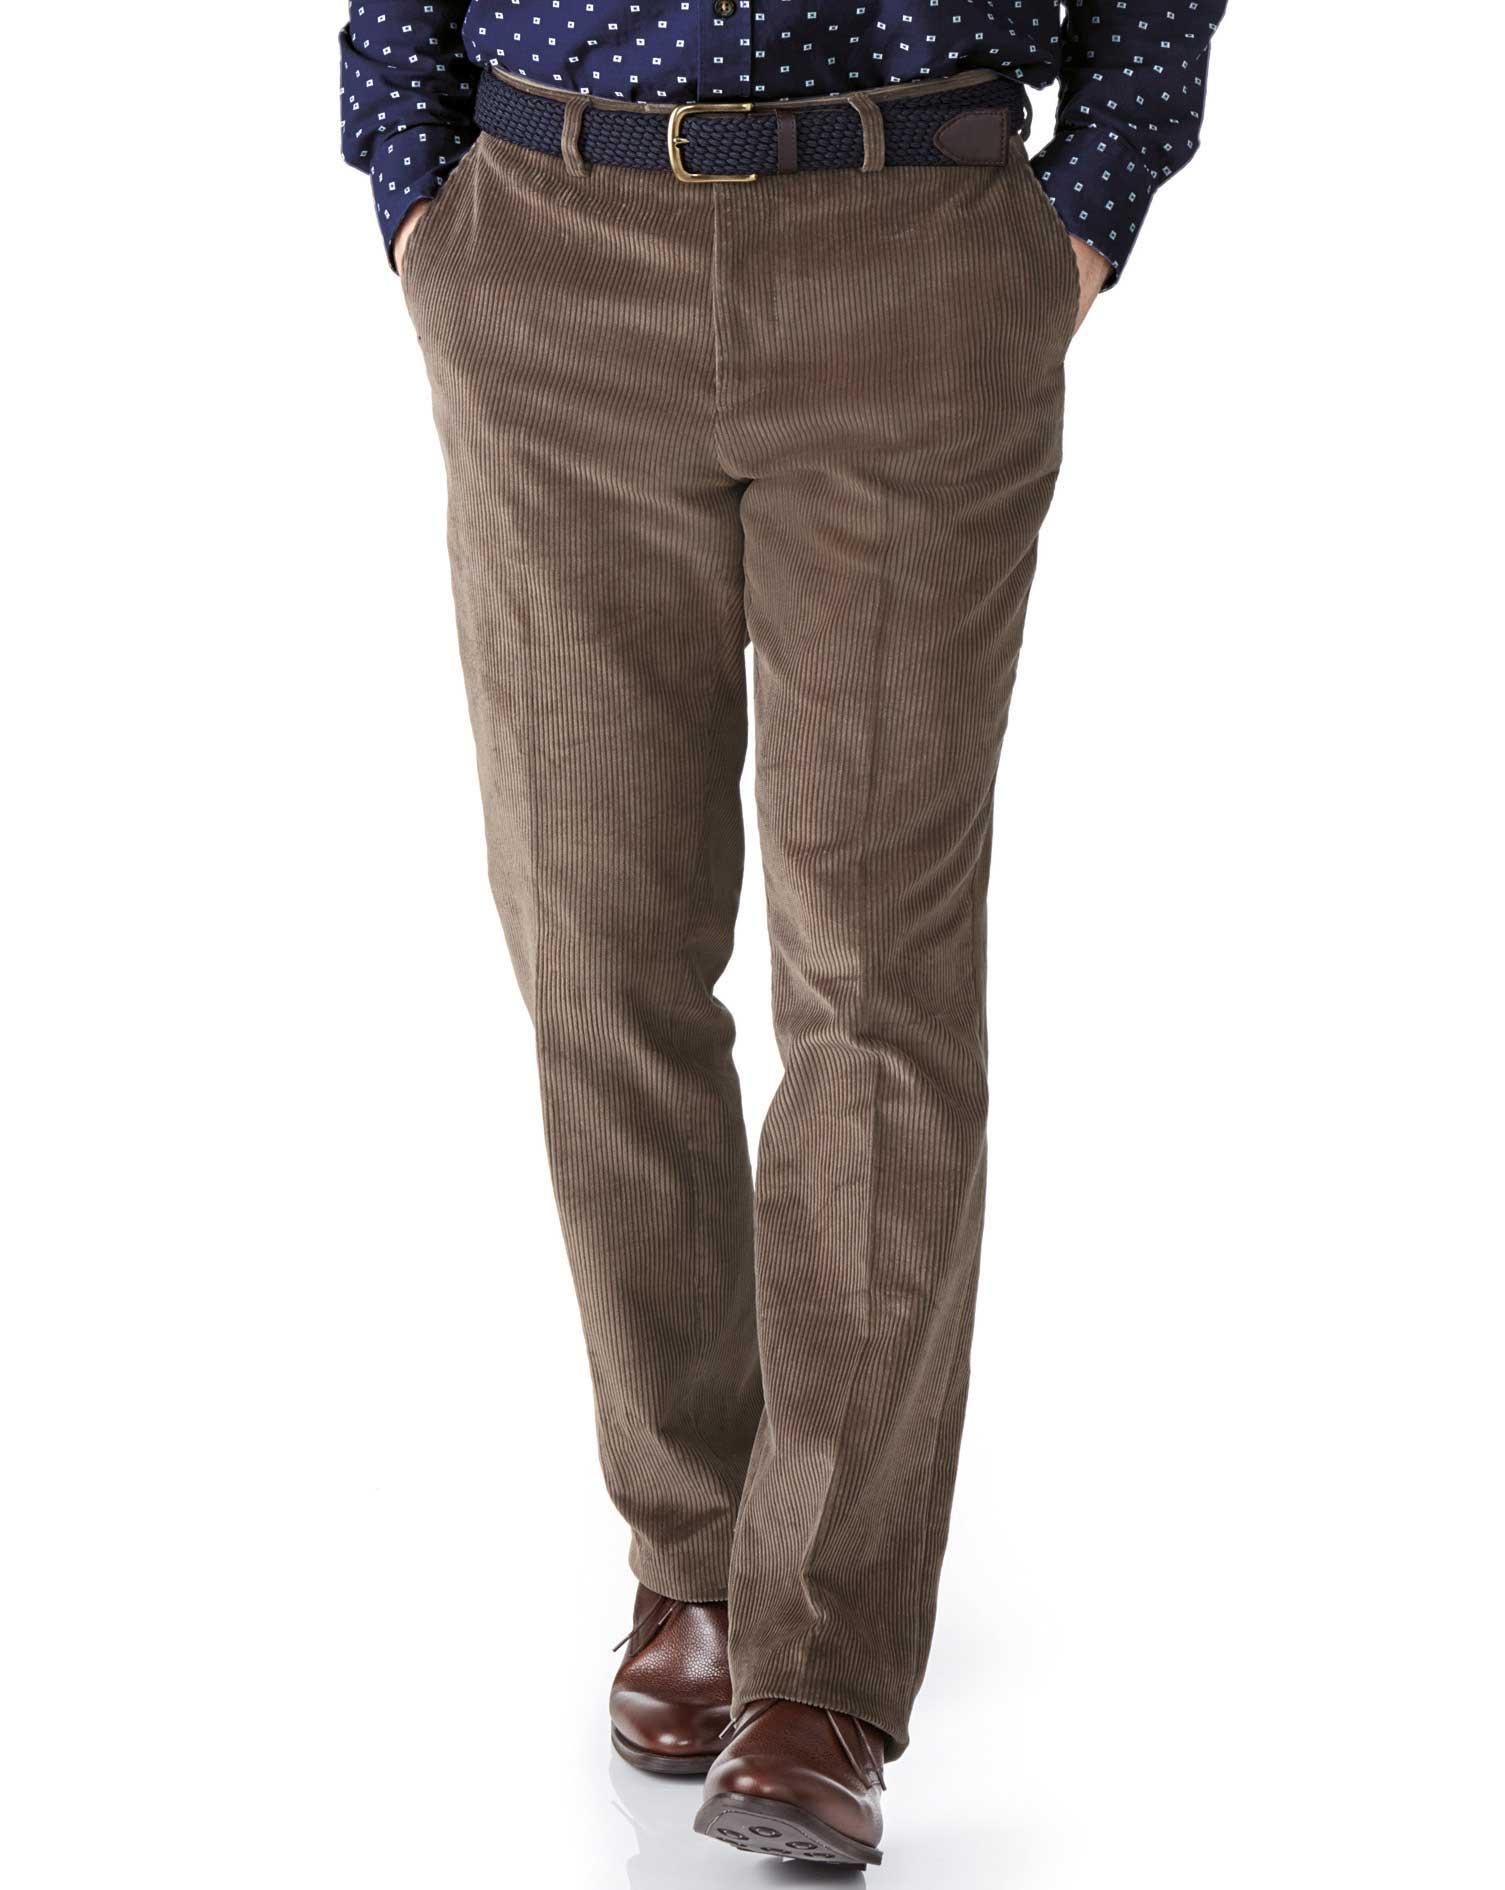 Beige Slim Fit Jumbo Cord Trouser Size W42 L30 by Charles Tyrwhitt